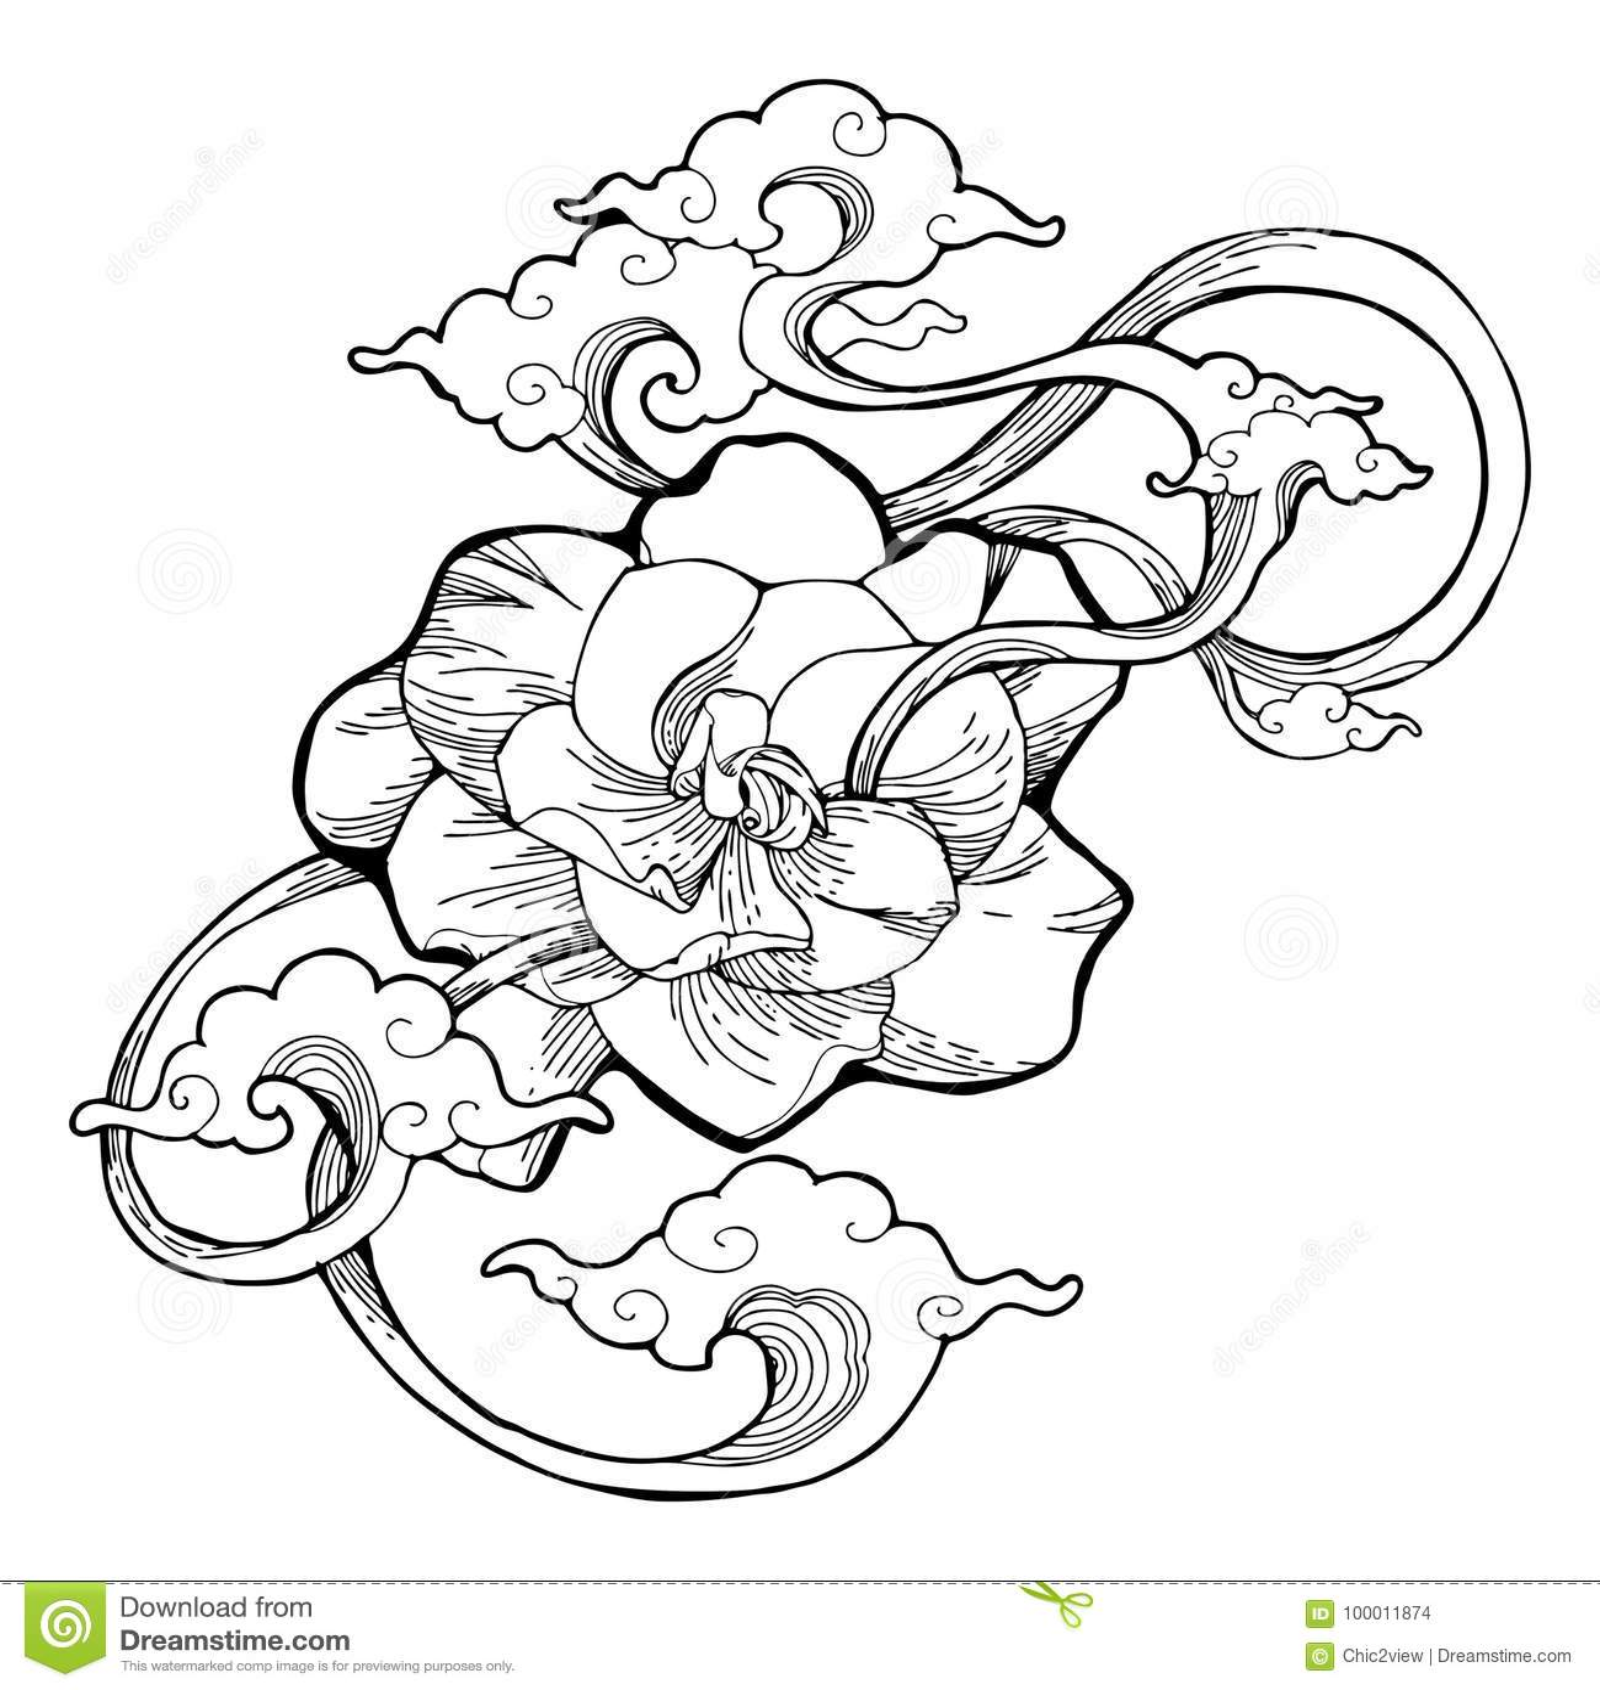 Le Jasmin De Cap Le Jasmin De Gardenia Et La Conception De Nuage D